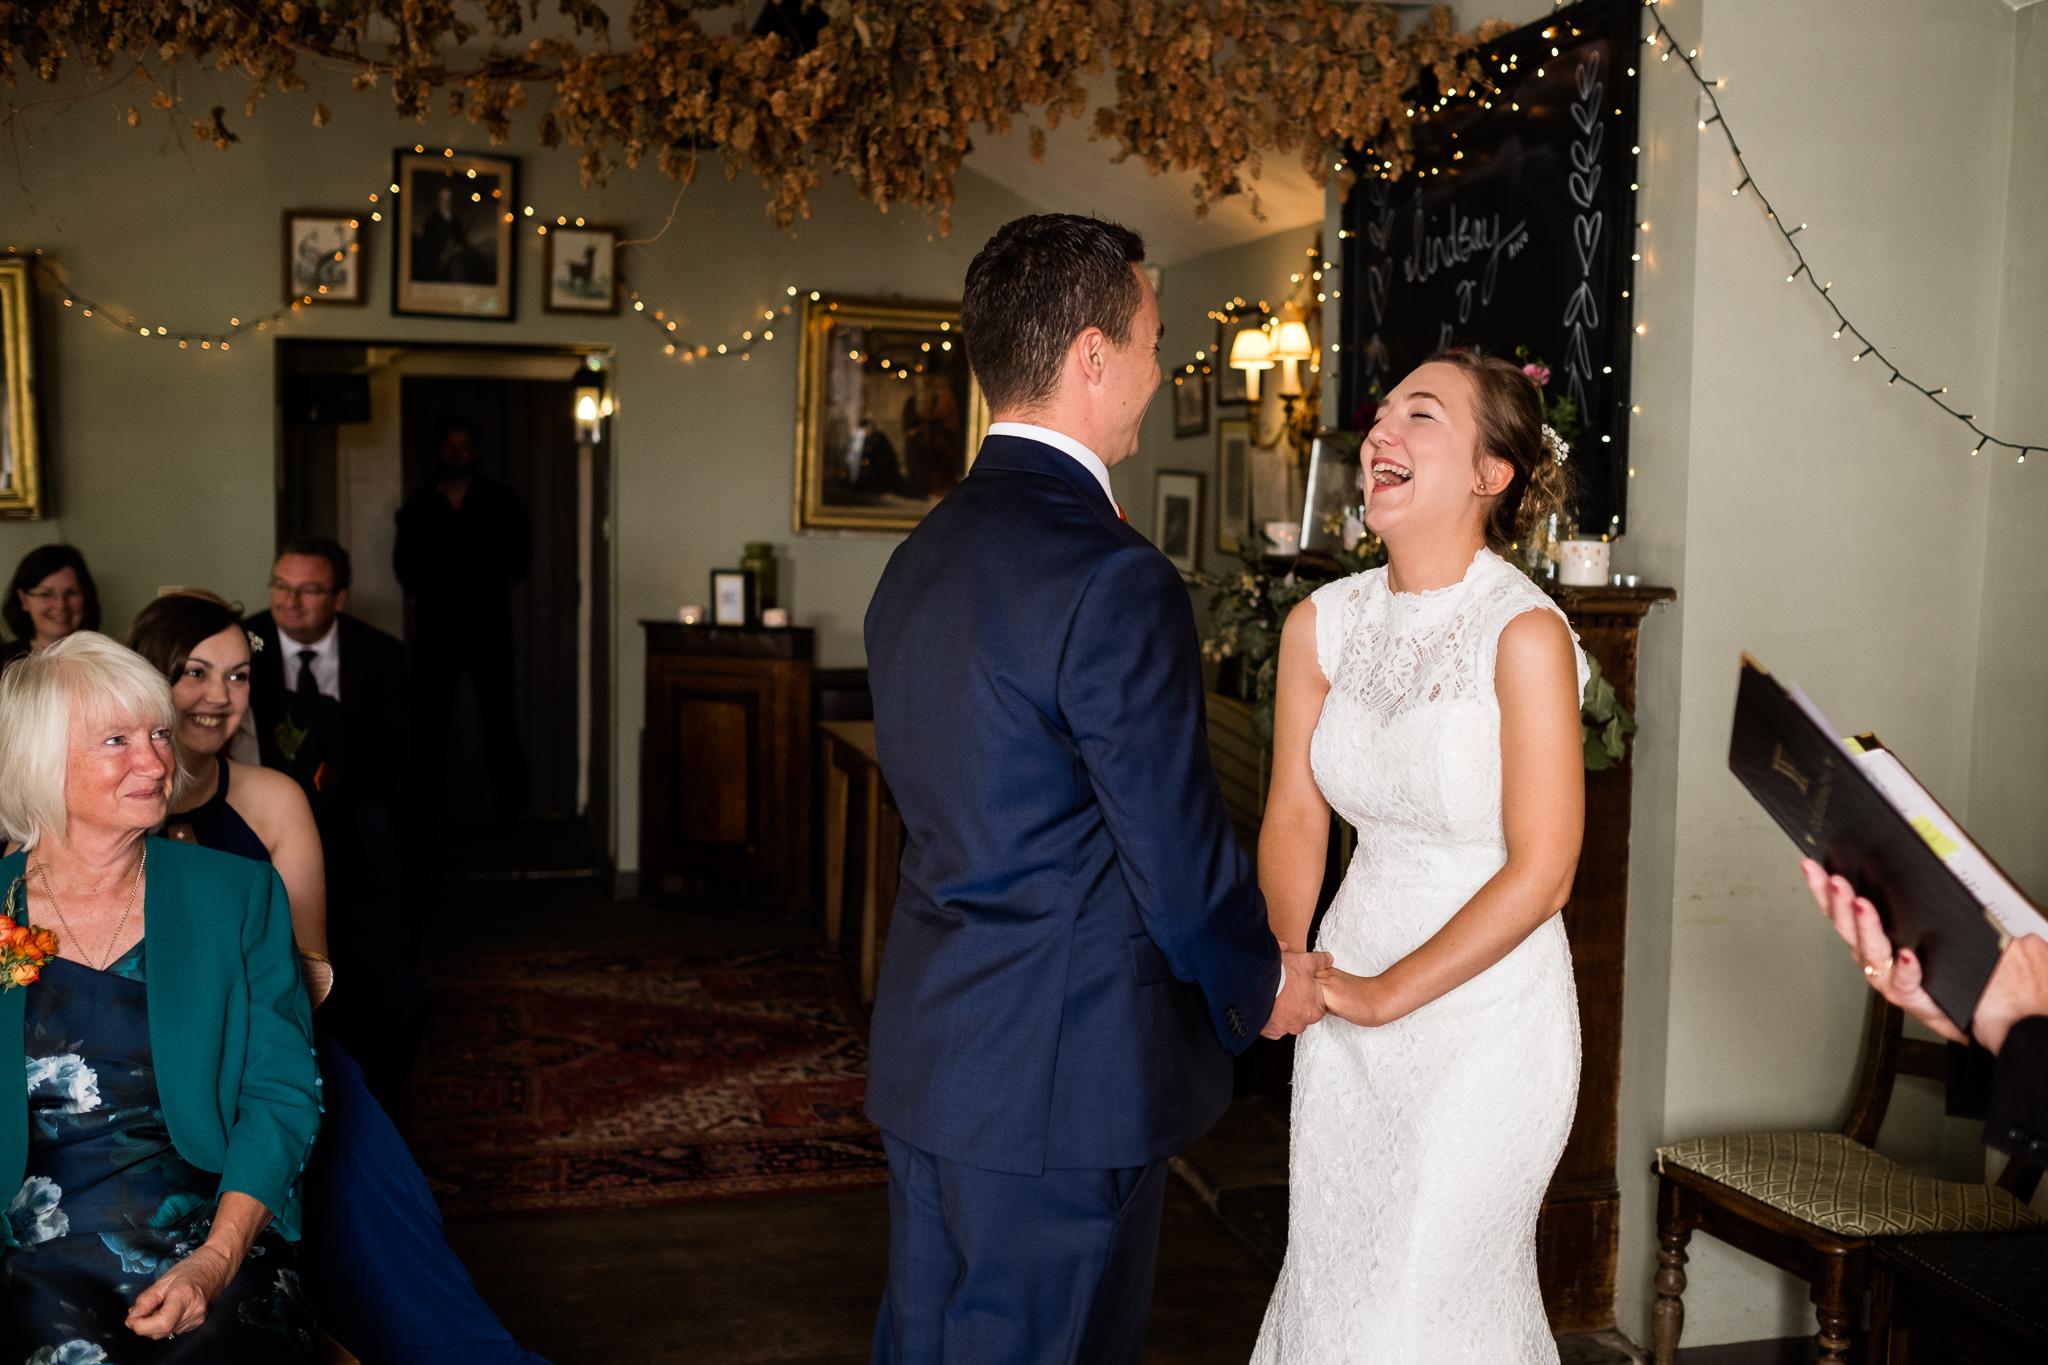 Relaxed Documentary Wedding Photography at The Wizard Inn, Alderley Edge Cheshire - Jenny Harper-28.jpg